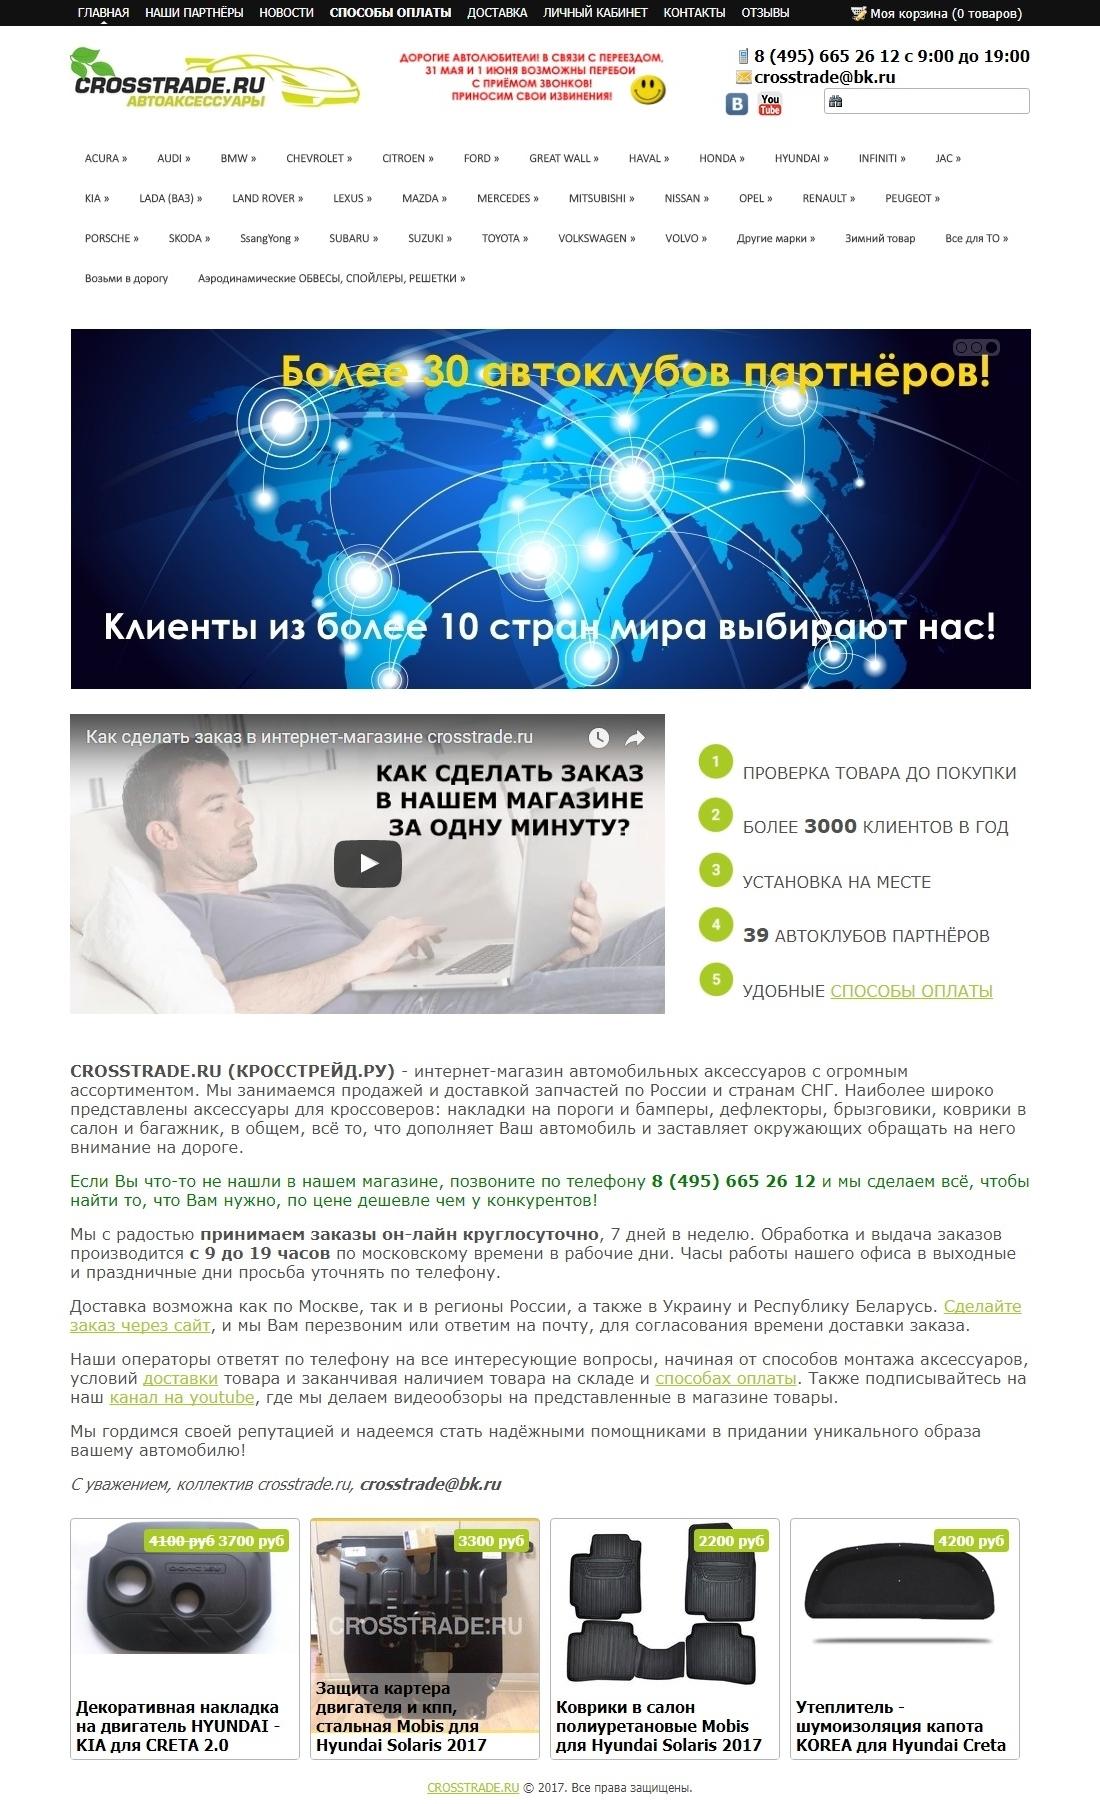 crosstrade.ru